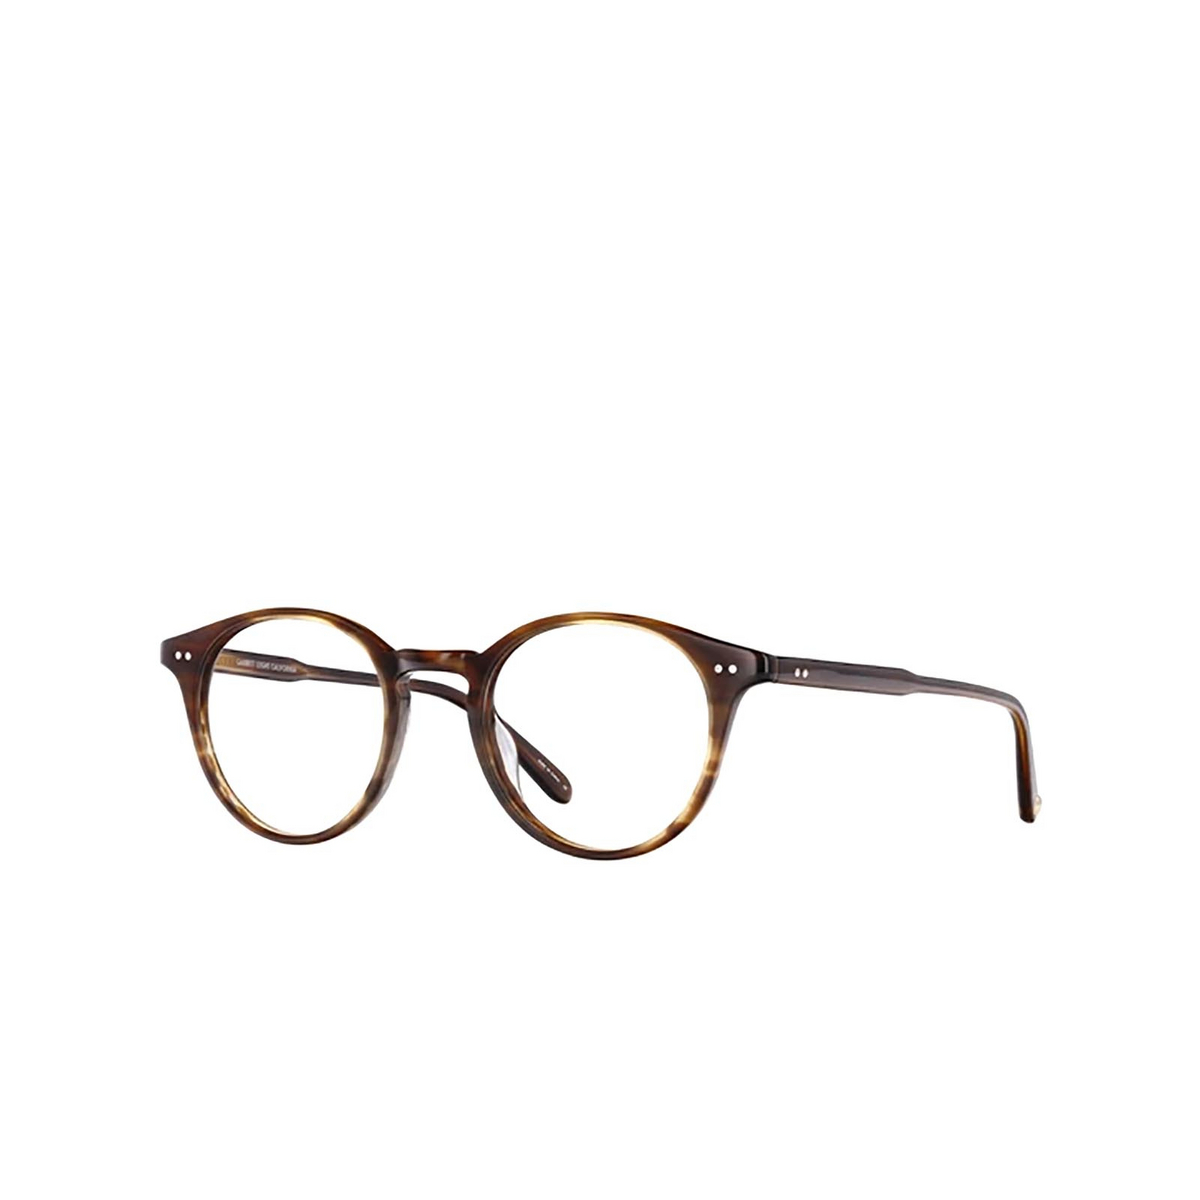 Garrett Leight® Round Eyeglasses: Clune color Brandy Tortoise Brt - three-quarters view.